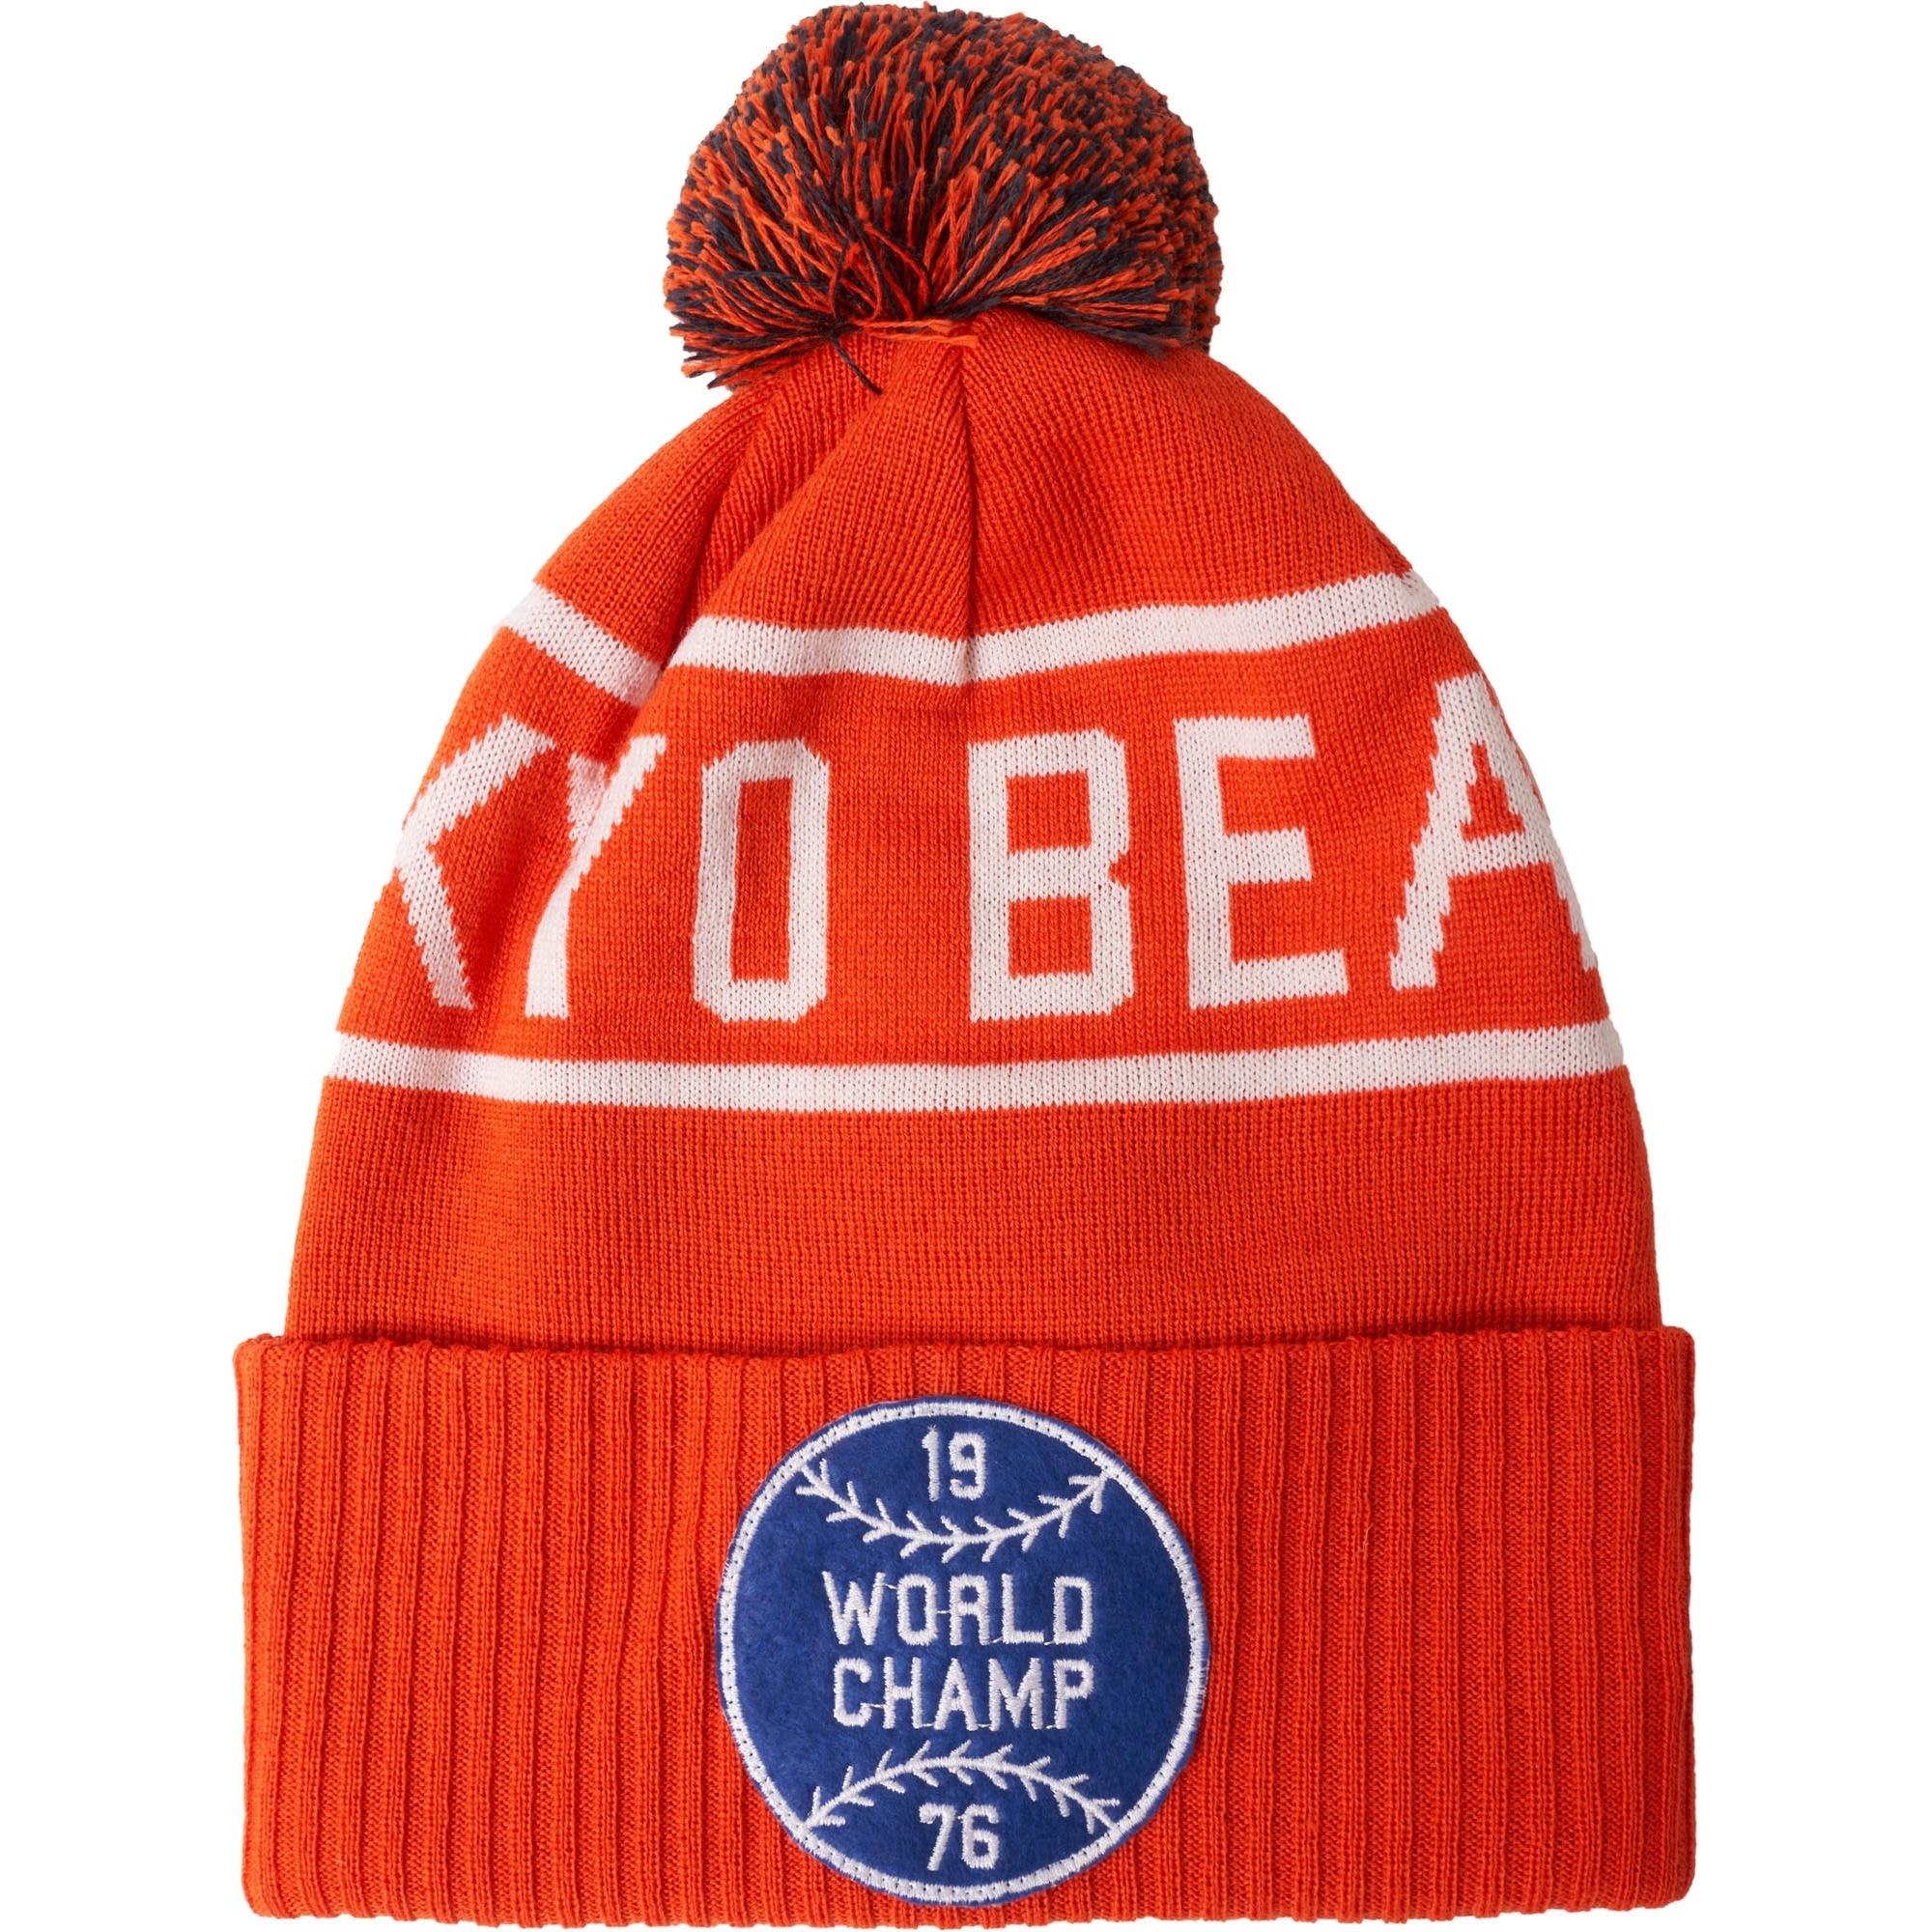 fe86bd7e Champion x Beams Beanie Hat | Orange | US Stockists